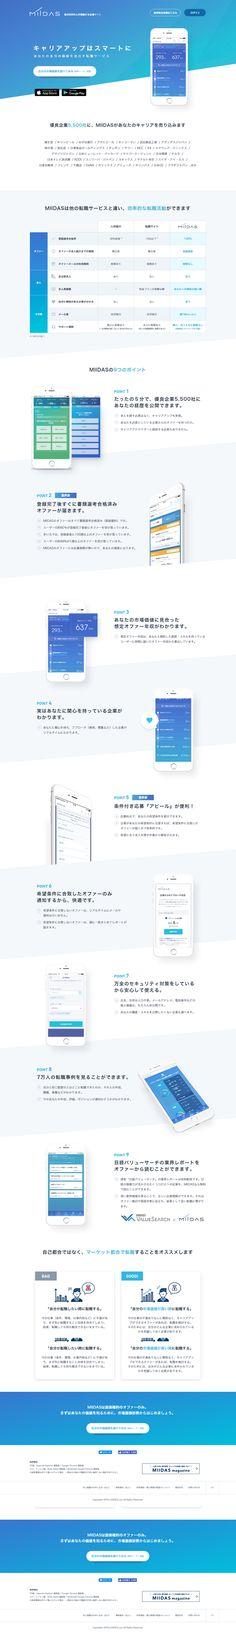 MIIDAS|WEBデザイナーさん必見!ランディングページのデザイン参考に(シンプル系)